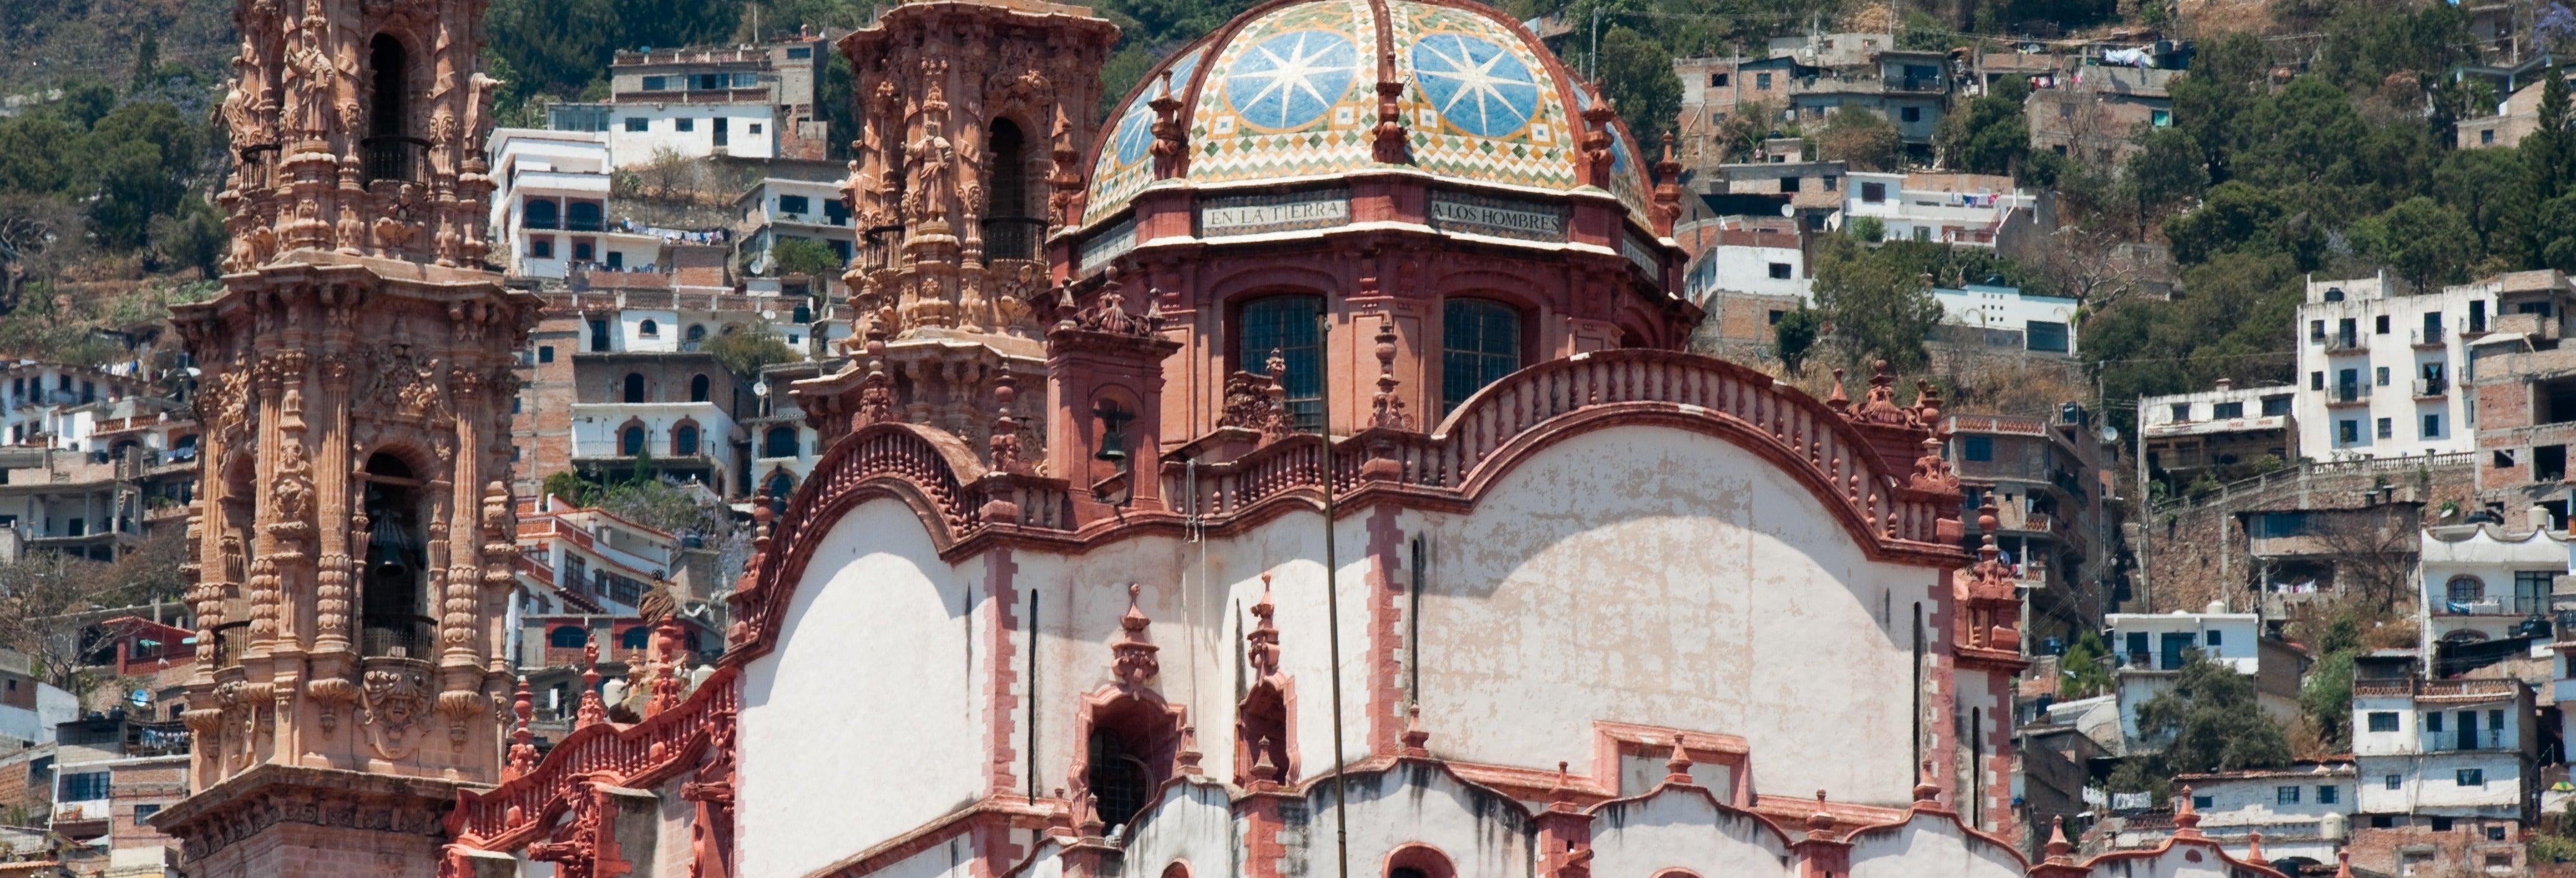 Excursão a Taxco